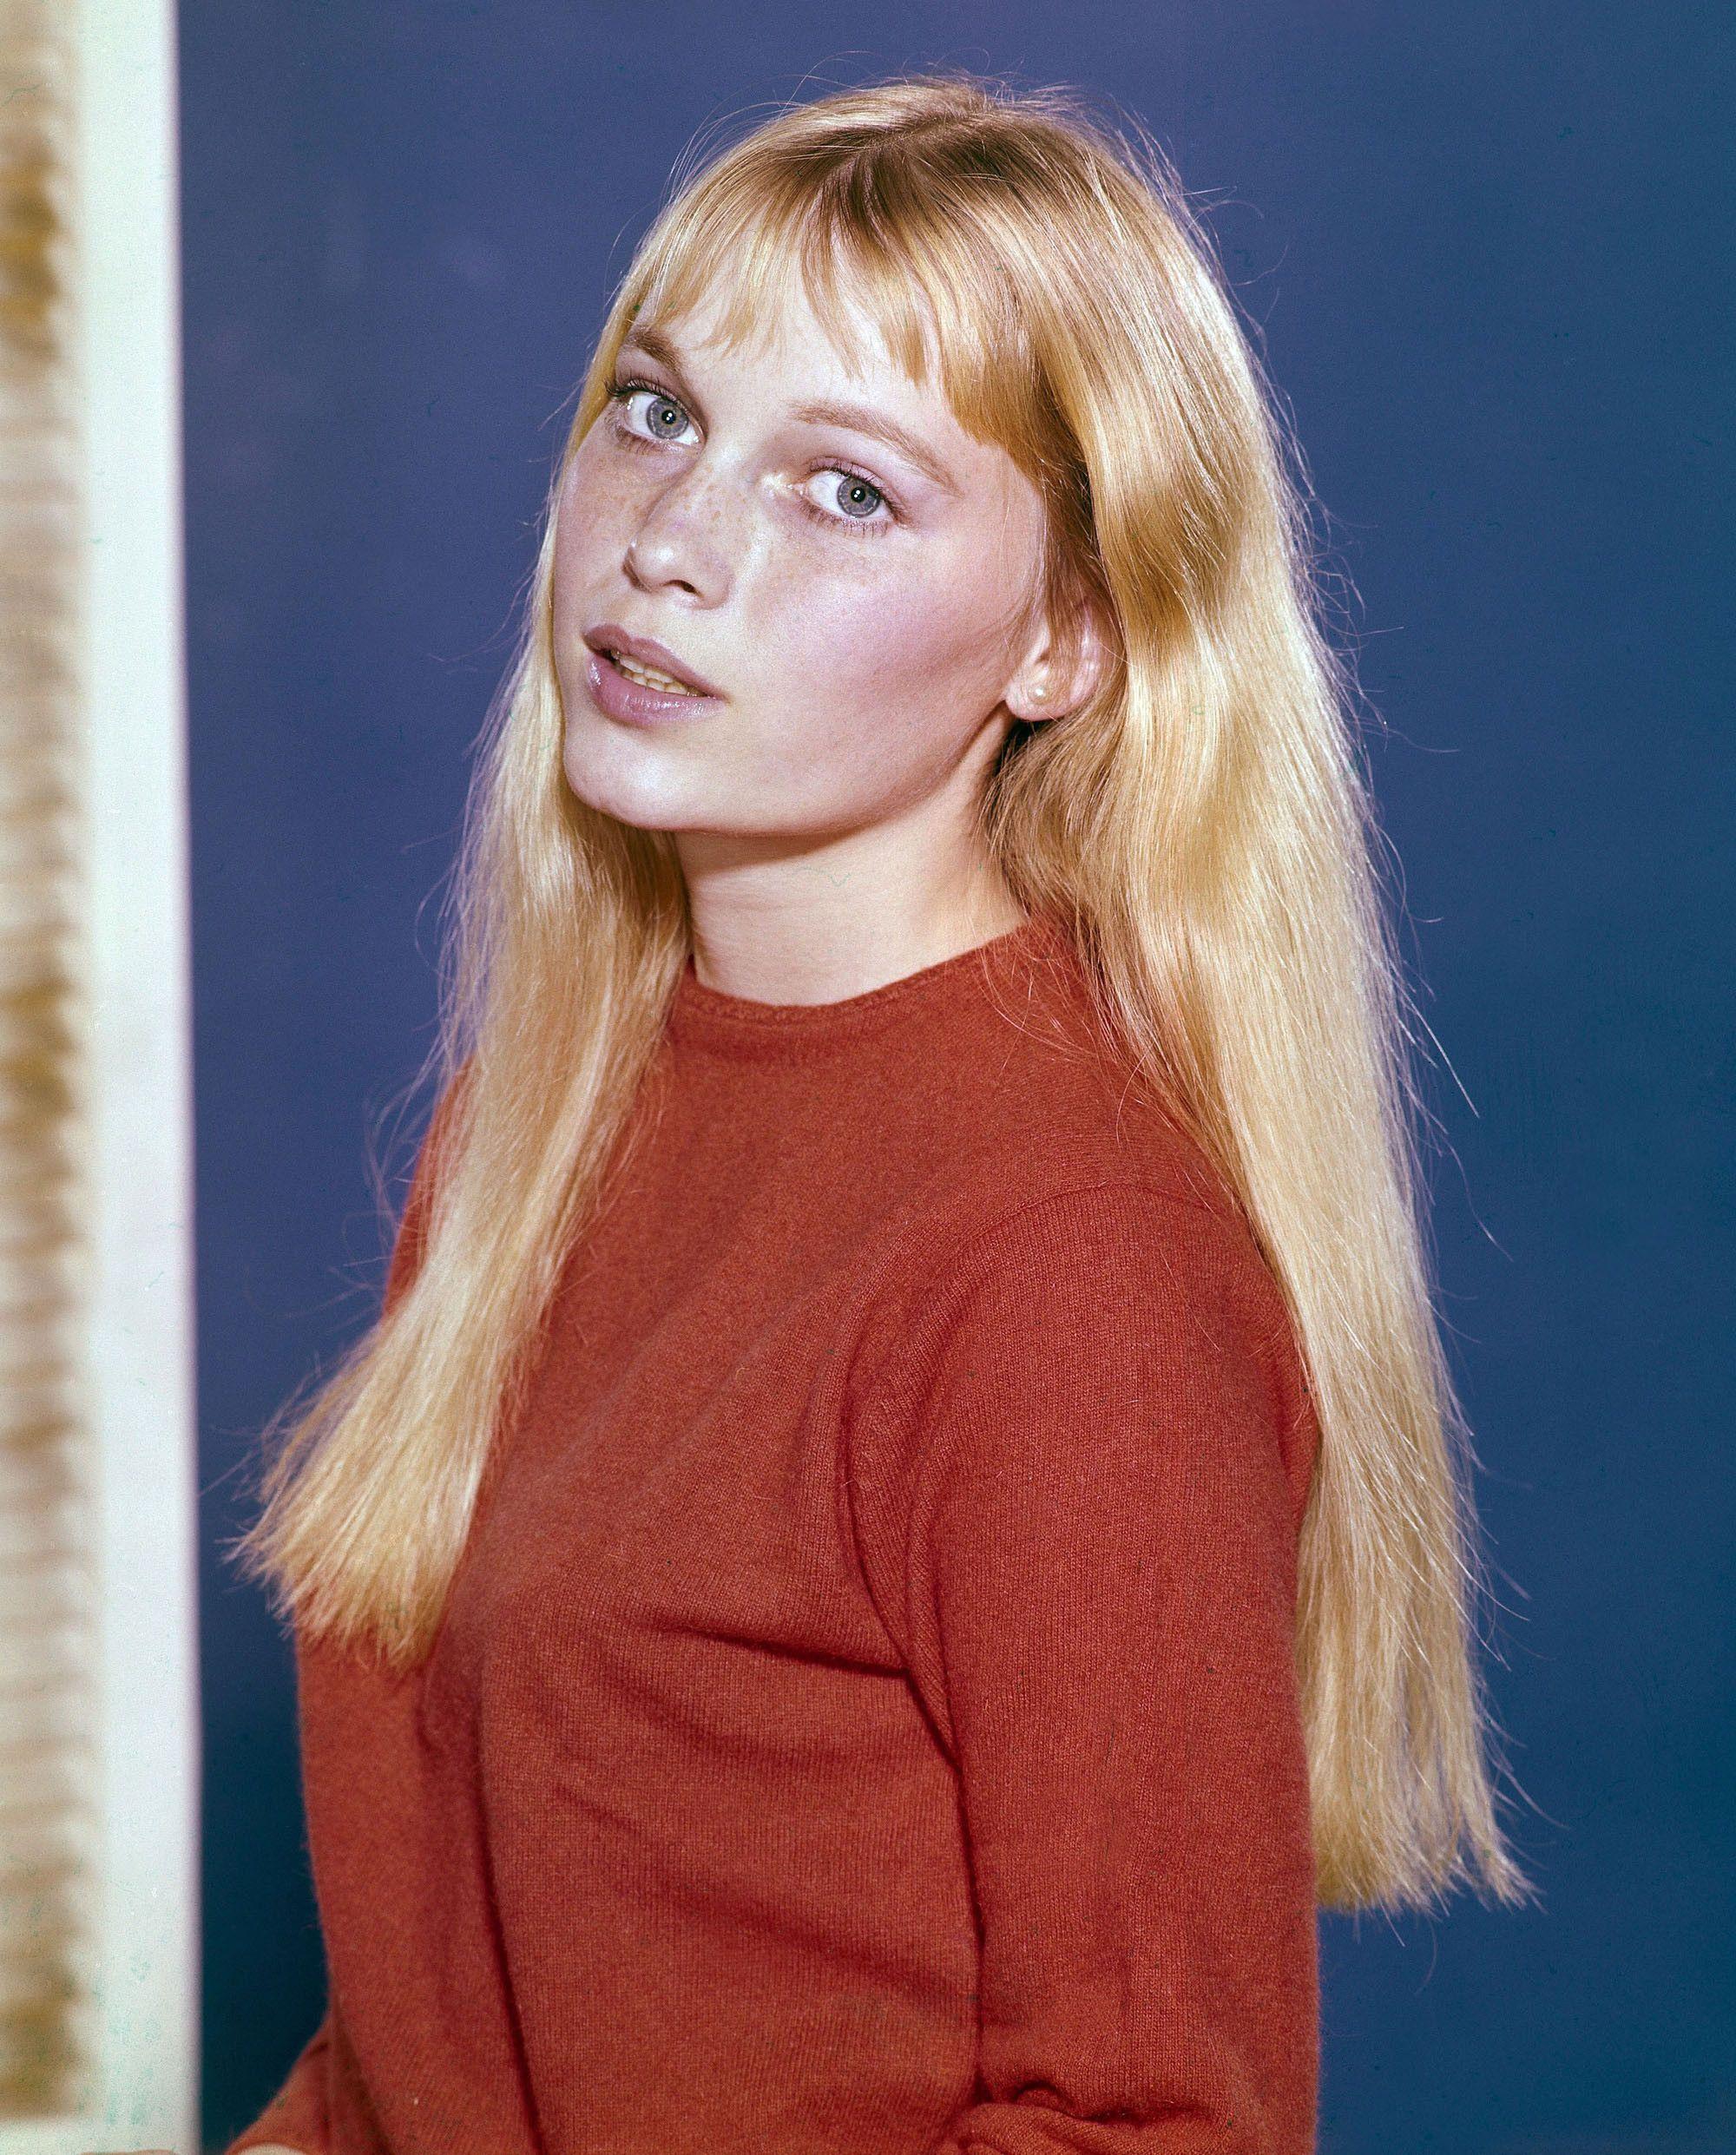 Evgenia Gl So Young Mia Farrow 1964 Young And